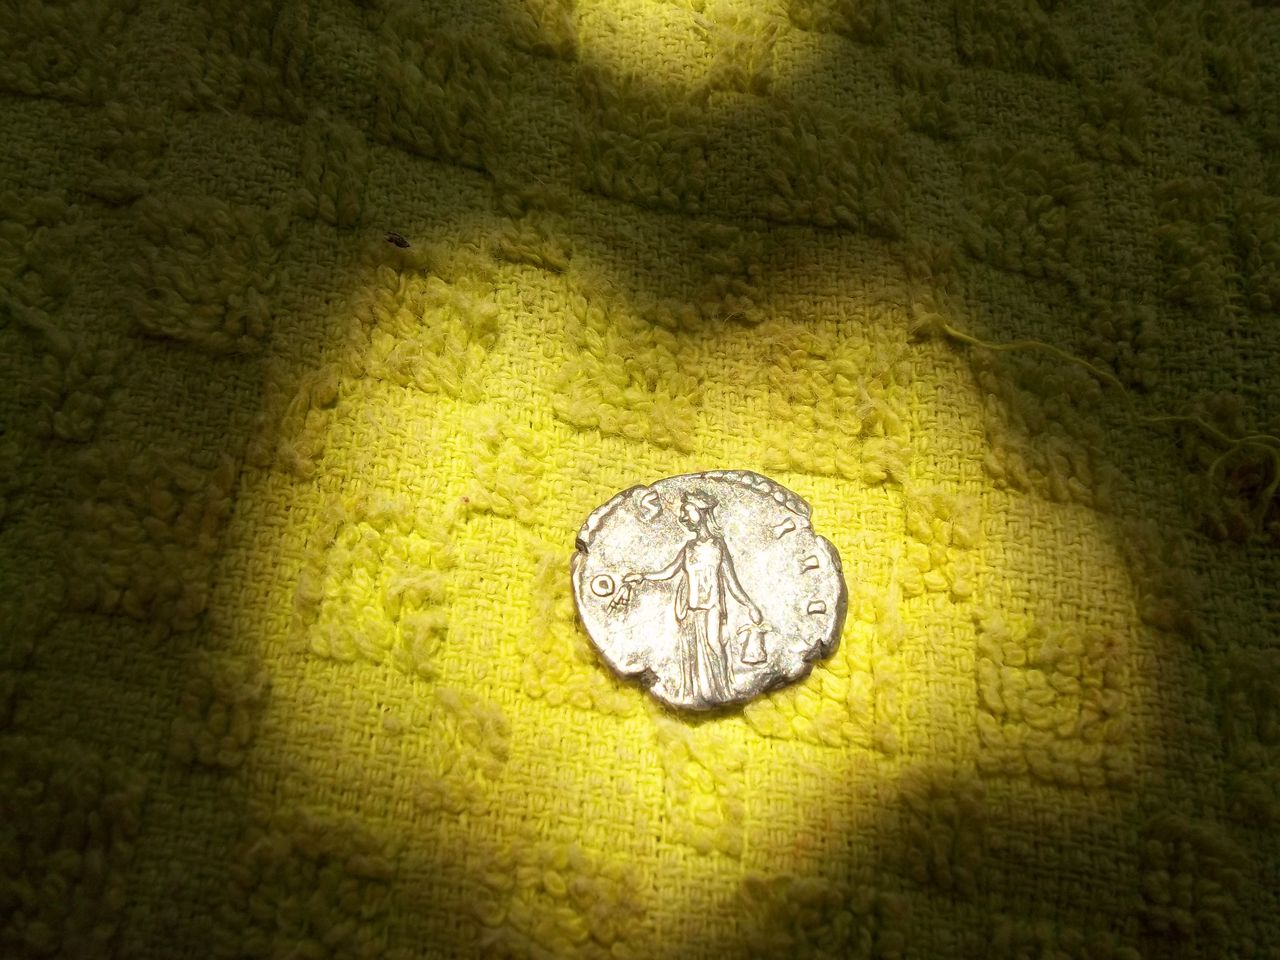 Glosario de monedas romanas. ANNONA. 100_2773